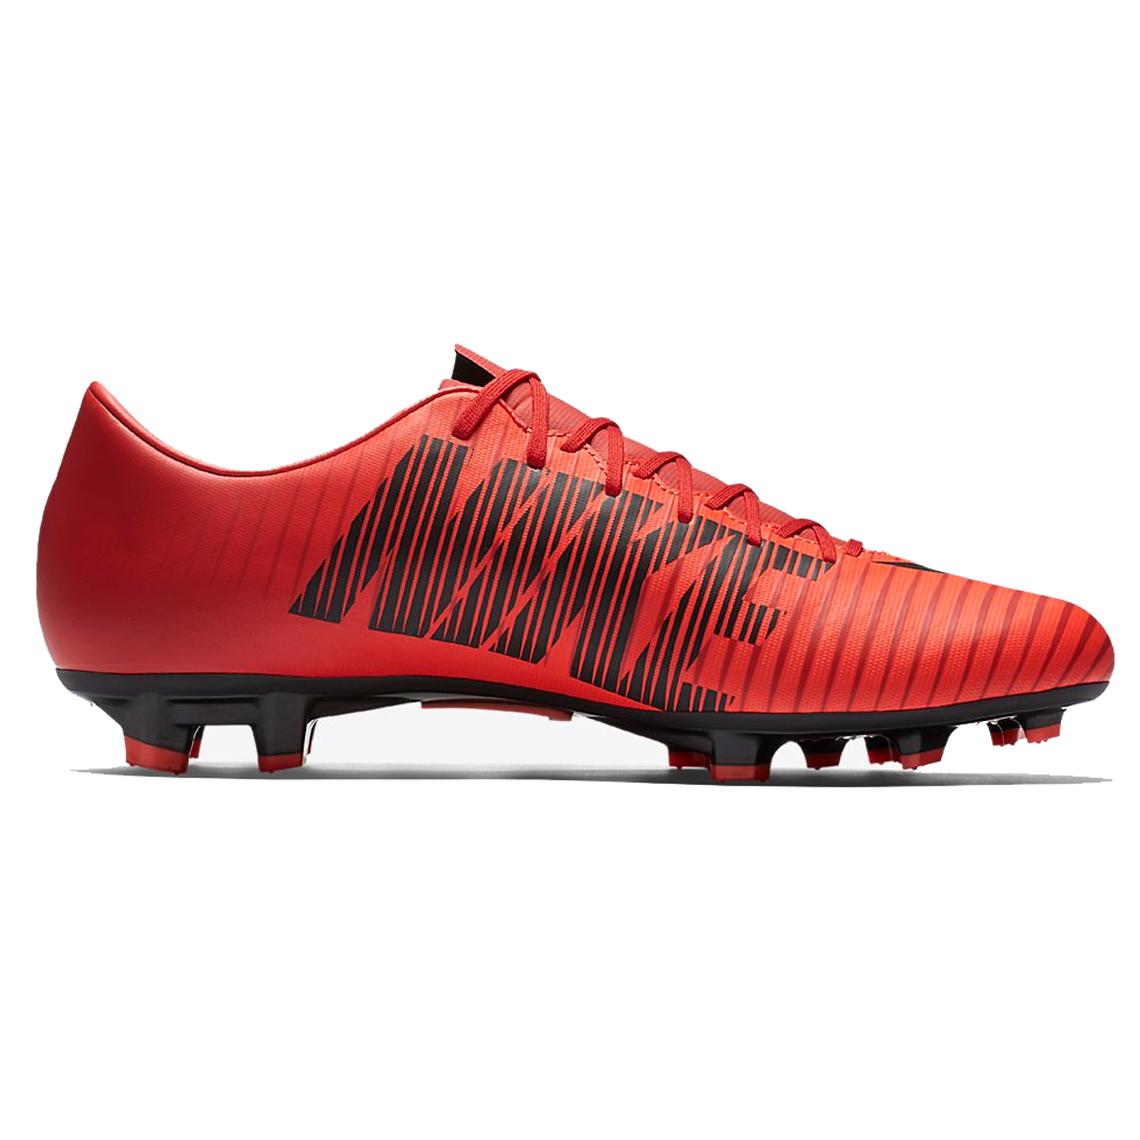 Nike Mercurial Victory III Firm Ground Football Boots - 7 v9008hJ